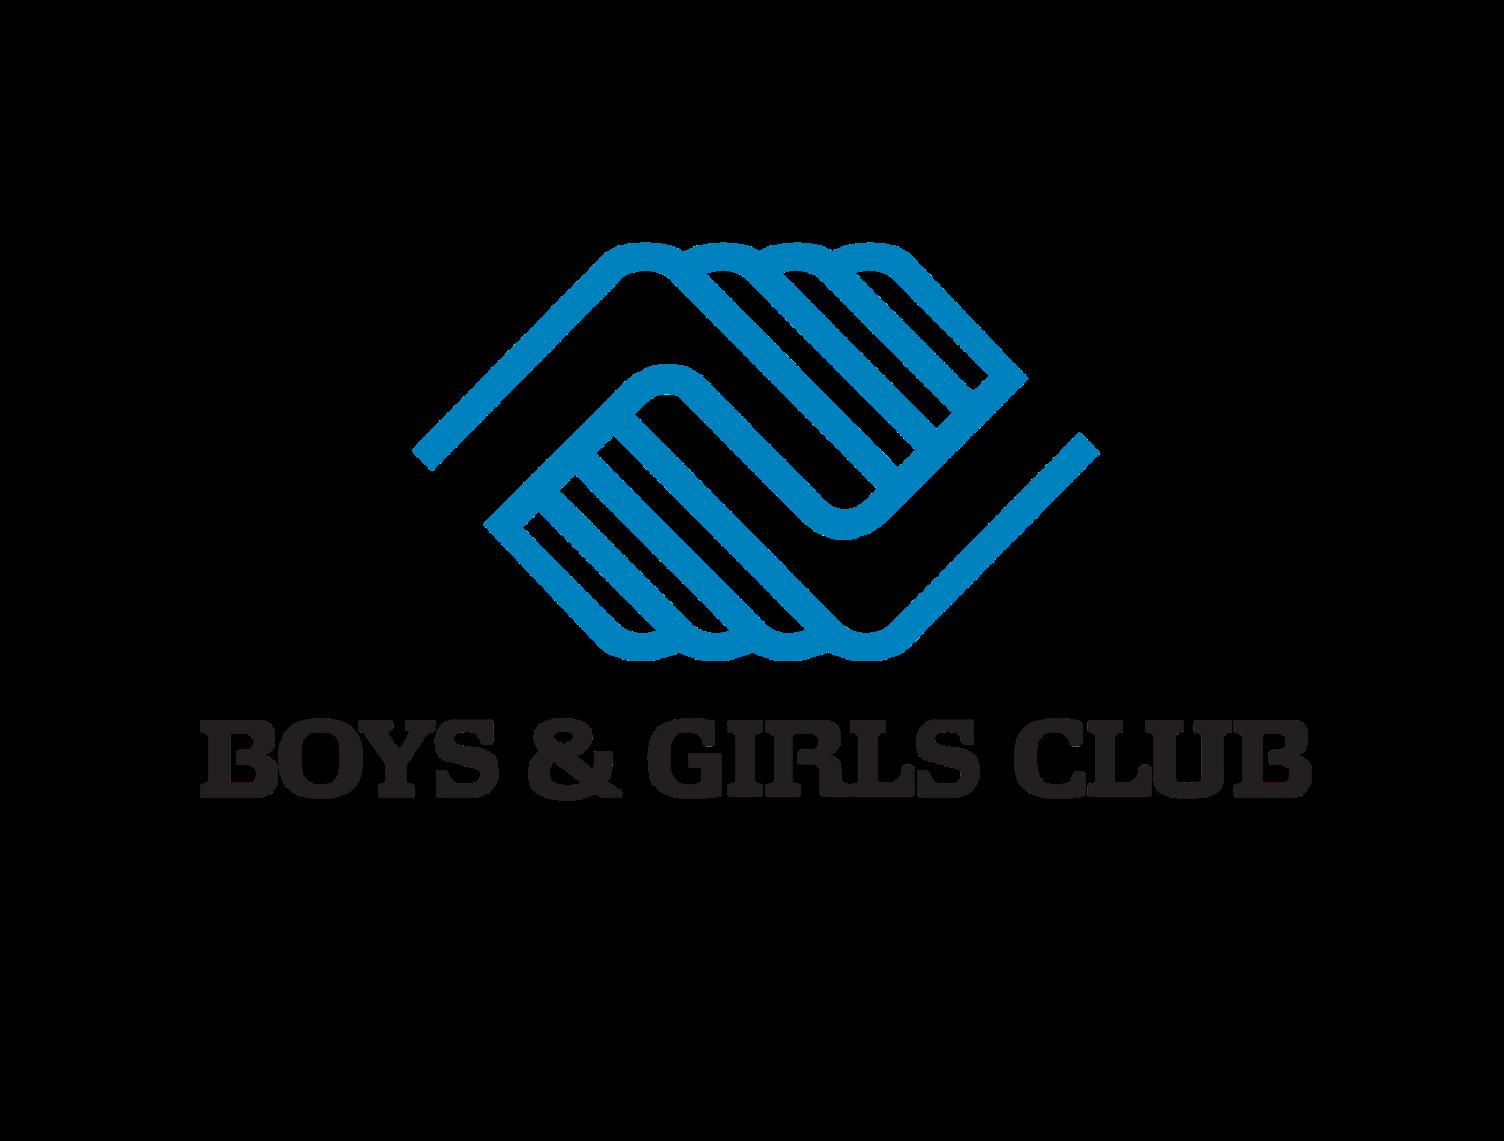 Boys and girls club logo smaller